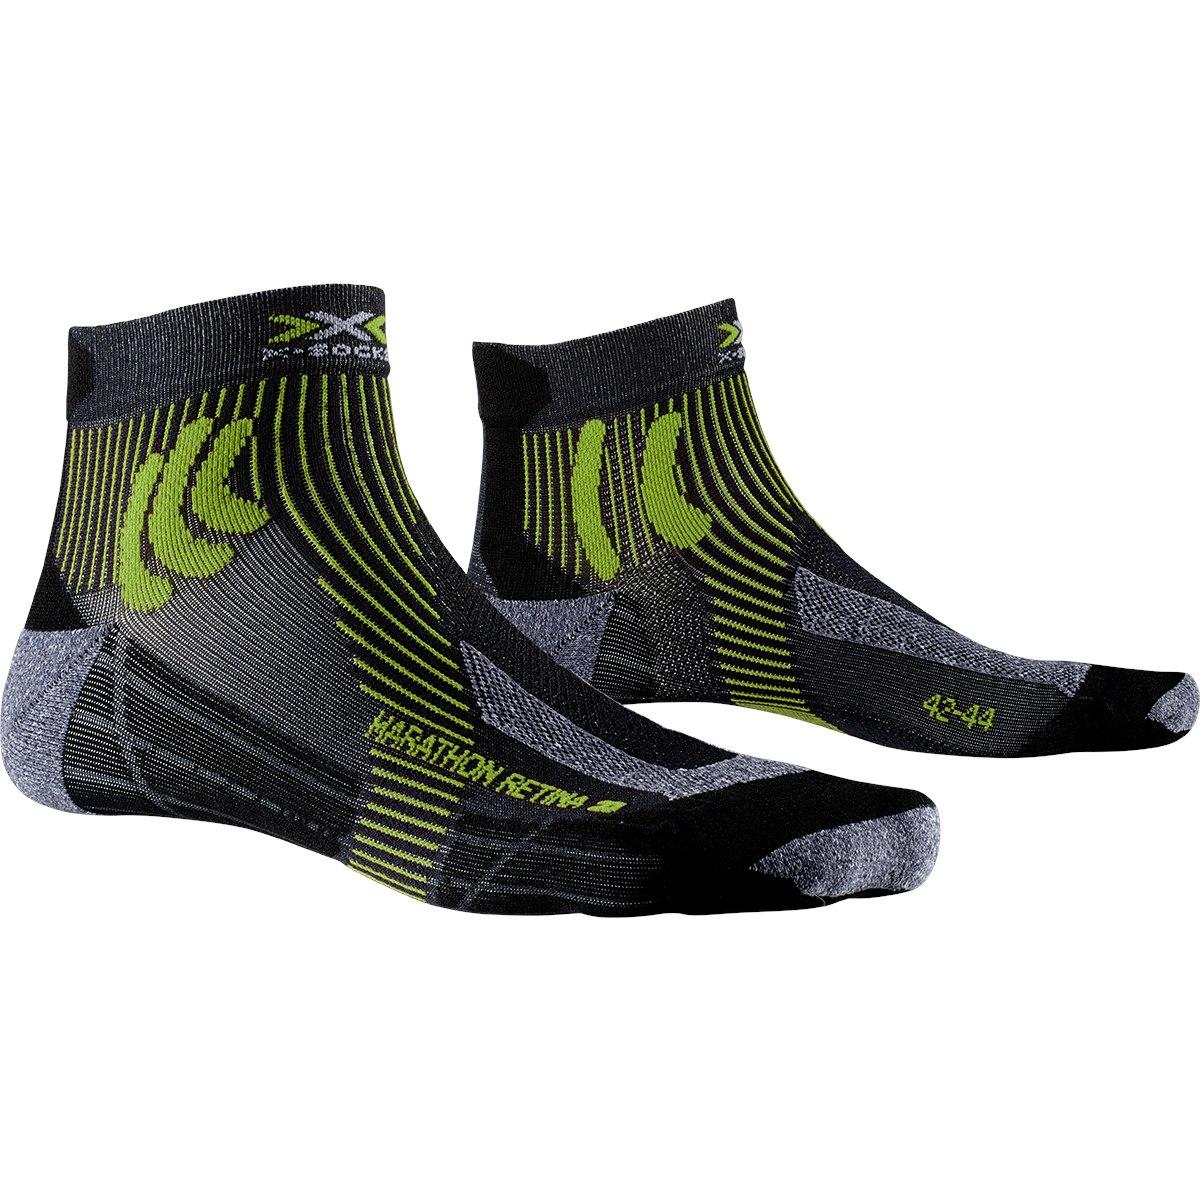 X-Socks Marathon Retina 4.0 Laufsocken - black melange/effektor green